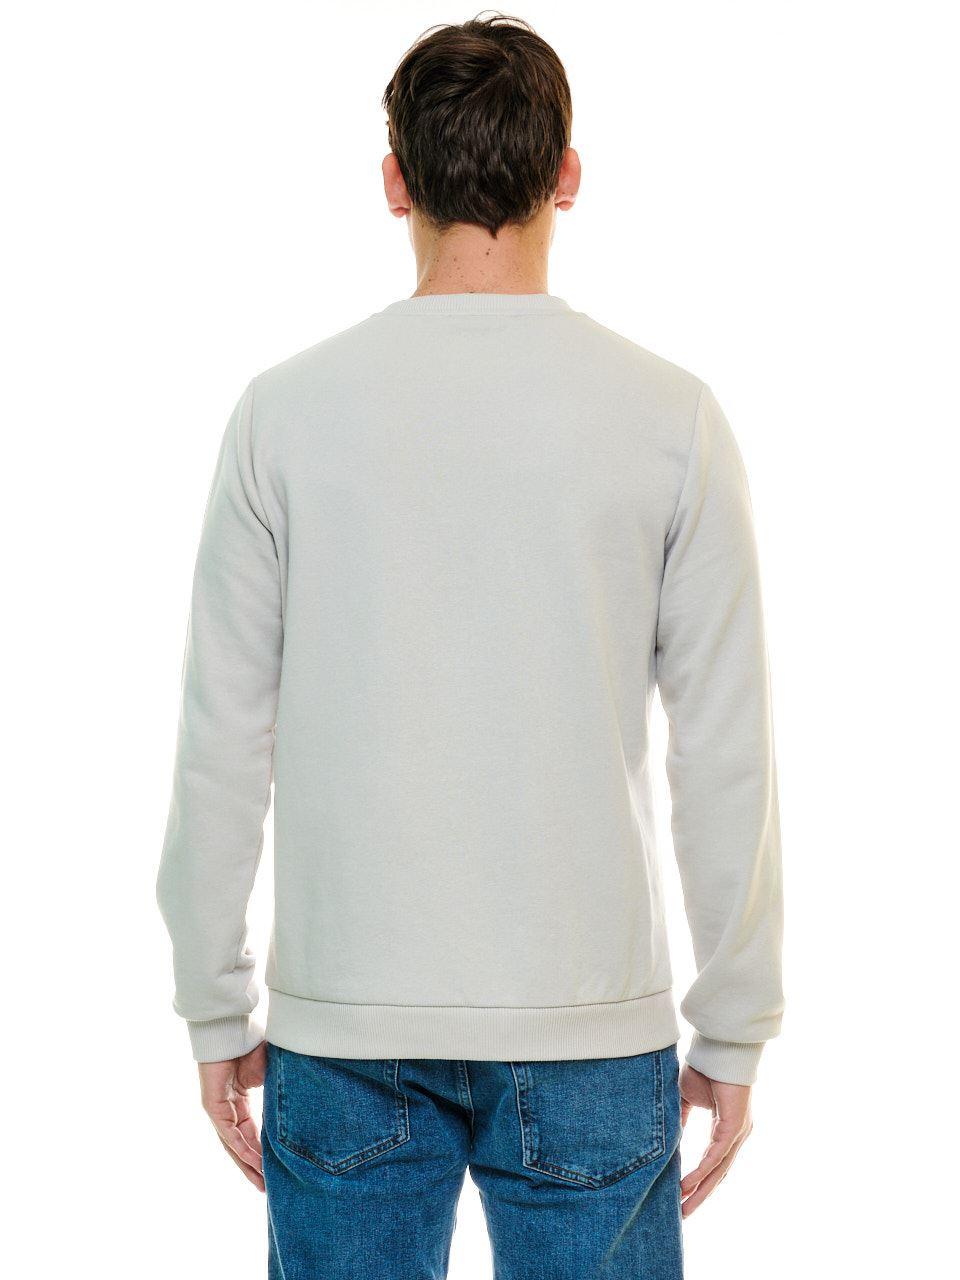 Galatasaray Erkek Sweatshirt E202085